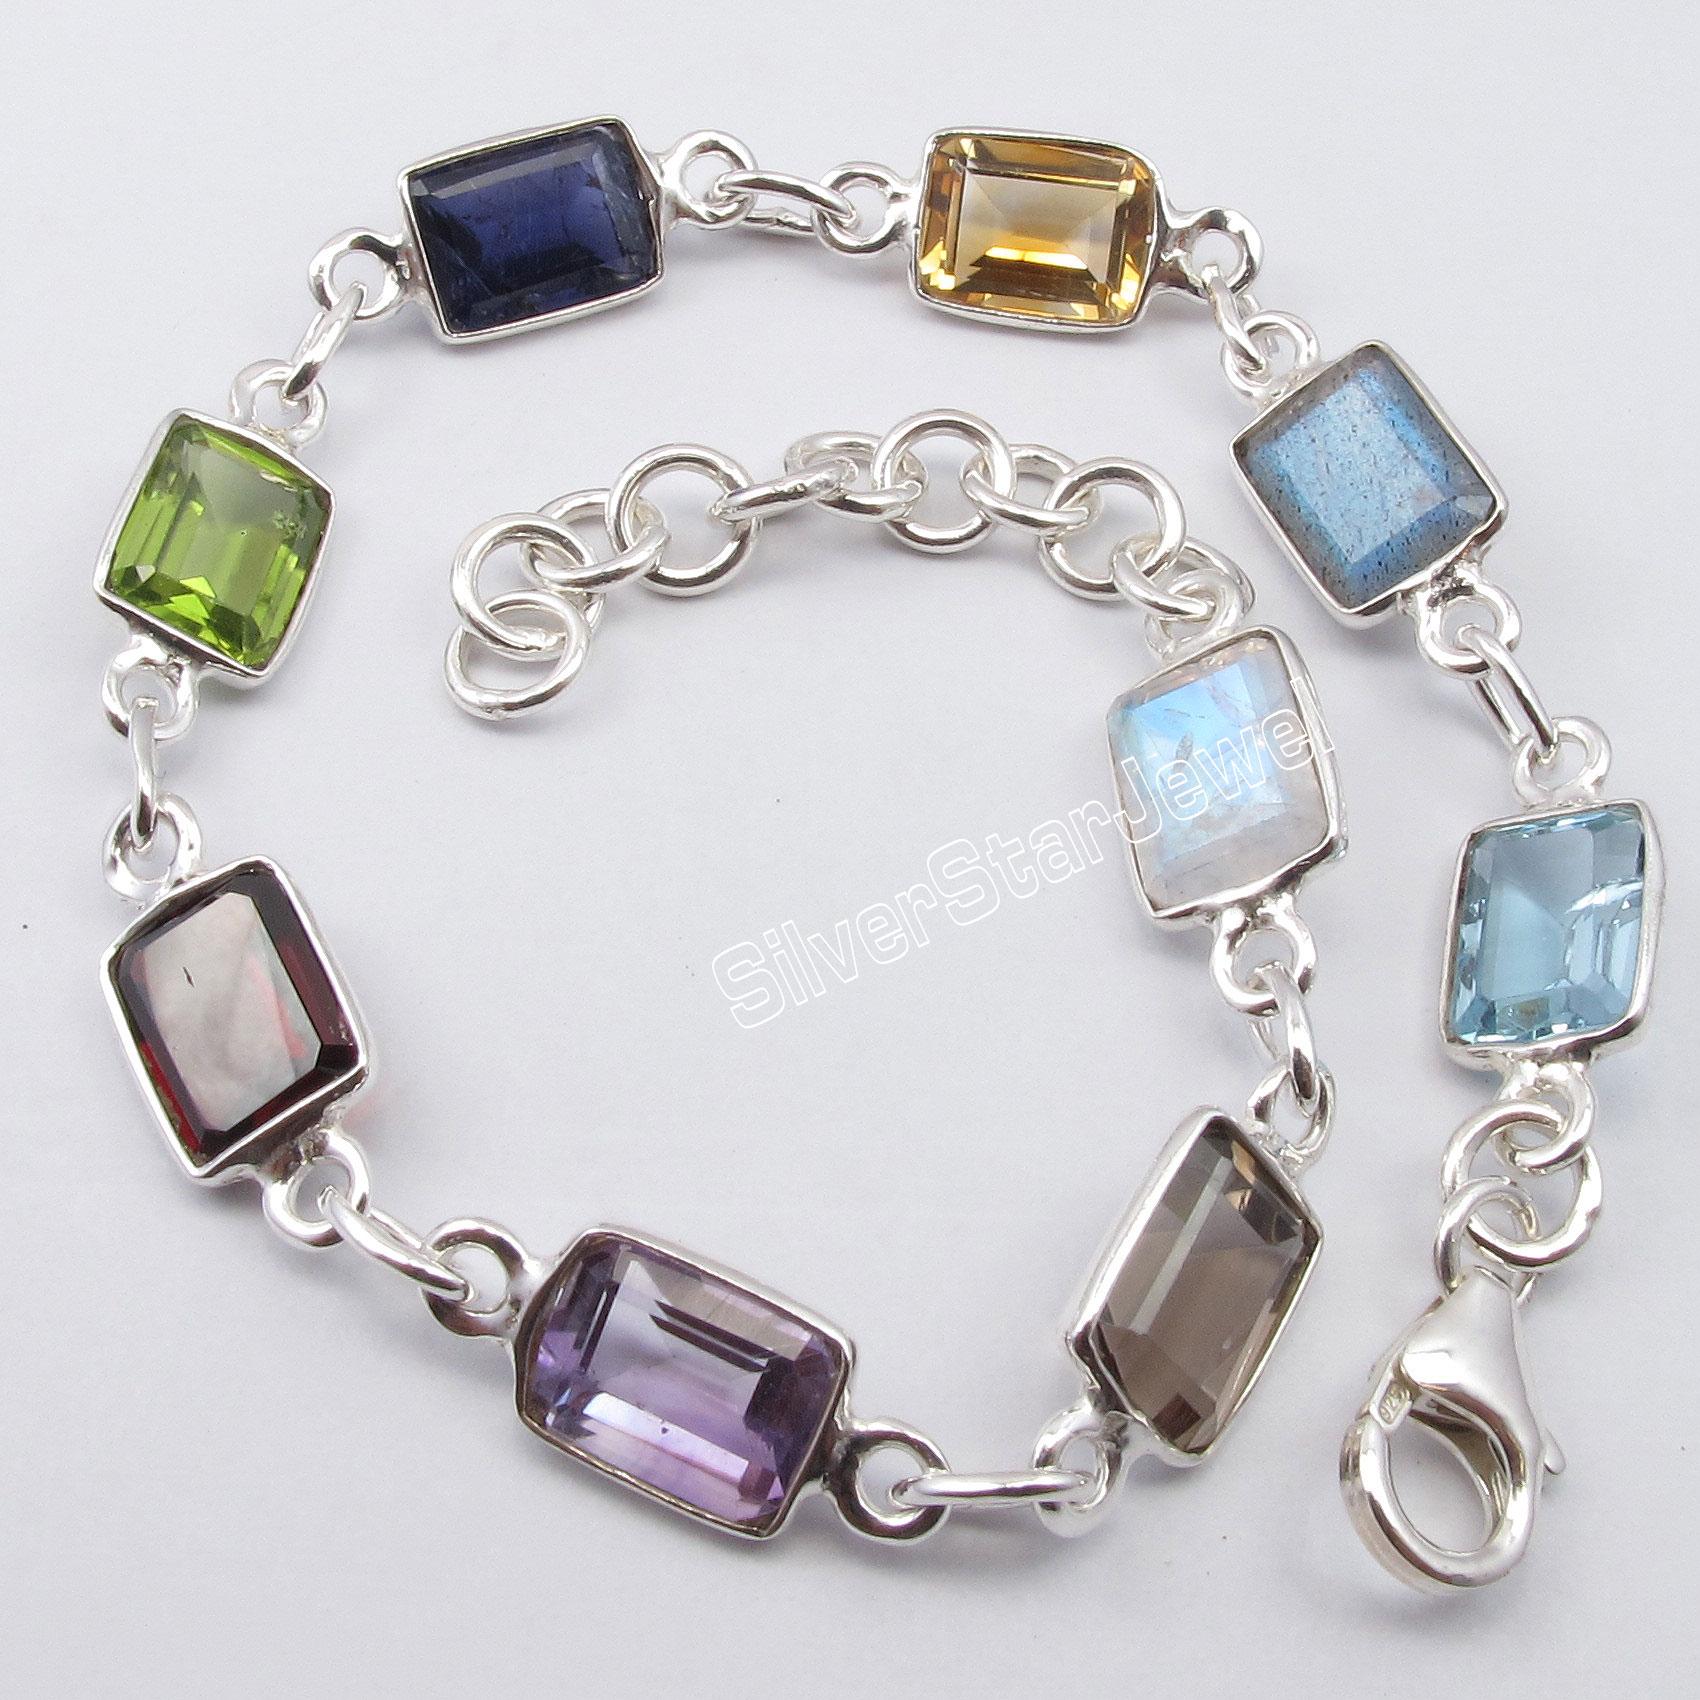 Chanti International Pure Silver COLORFUL Rectangle MULISTONE Bracelet 8 3/8 Inches JEWELRY STORE fashion plus 8 inches